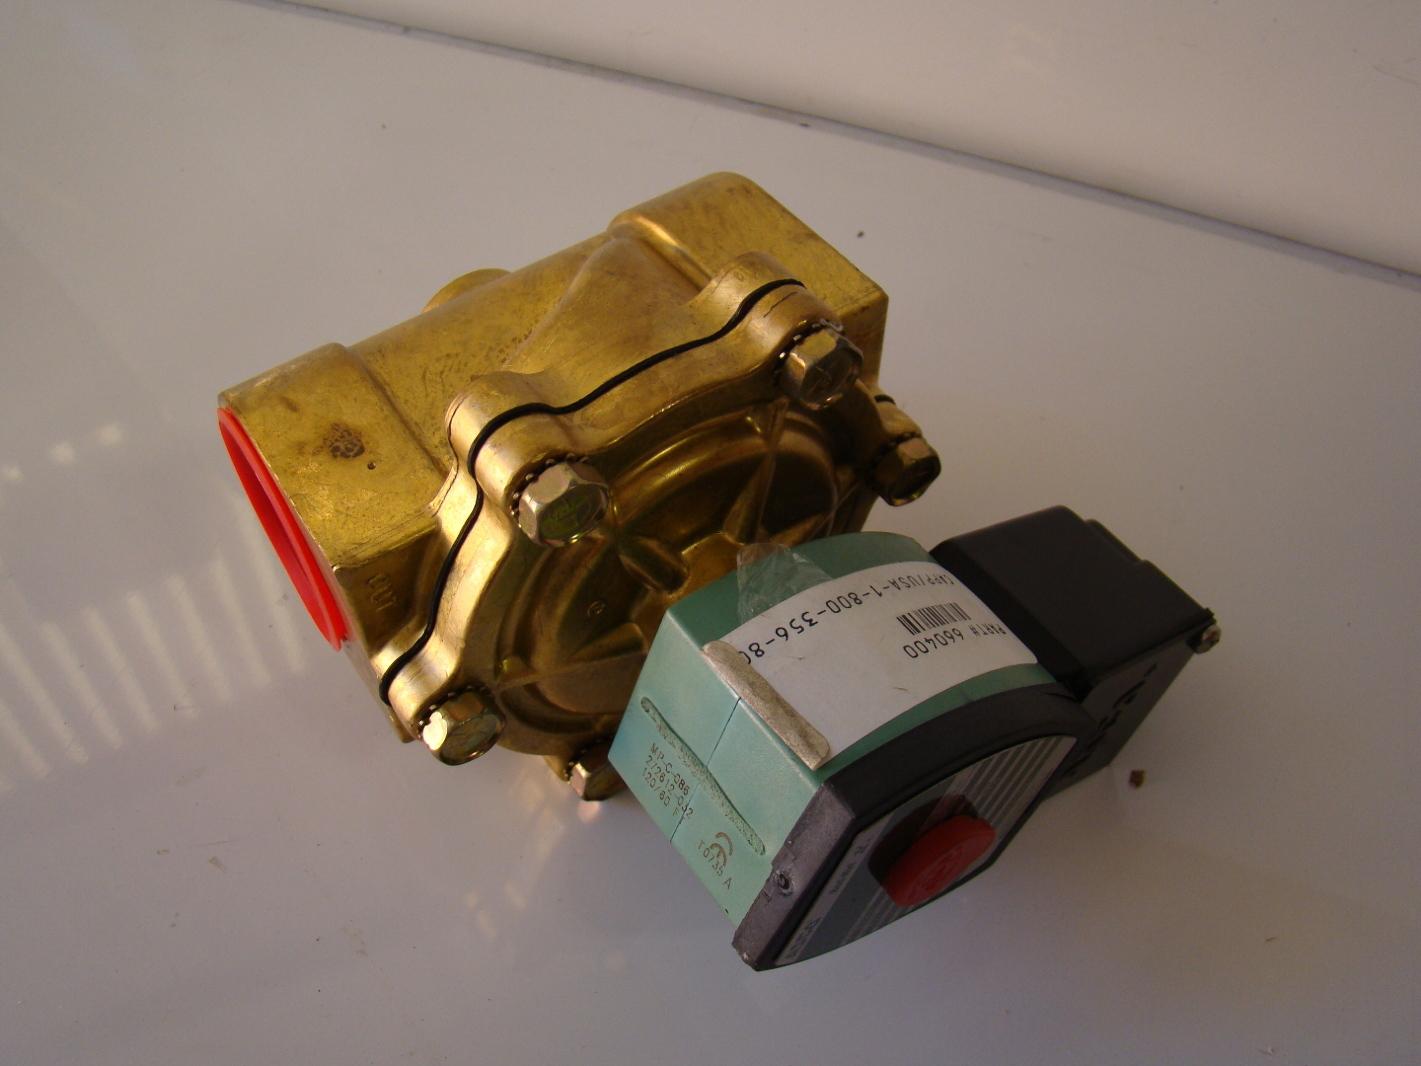 asco solenoid valve 8210 wiring diagram pioneer avx p7000cd red hat 1 5 quot jsfx8210g05613600 ebay